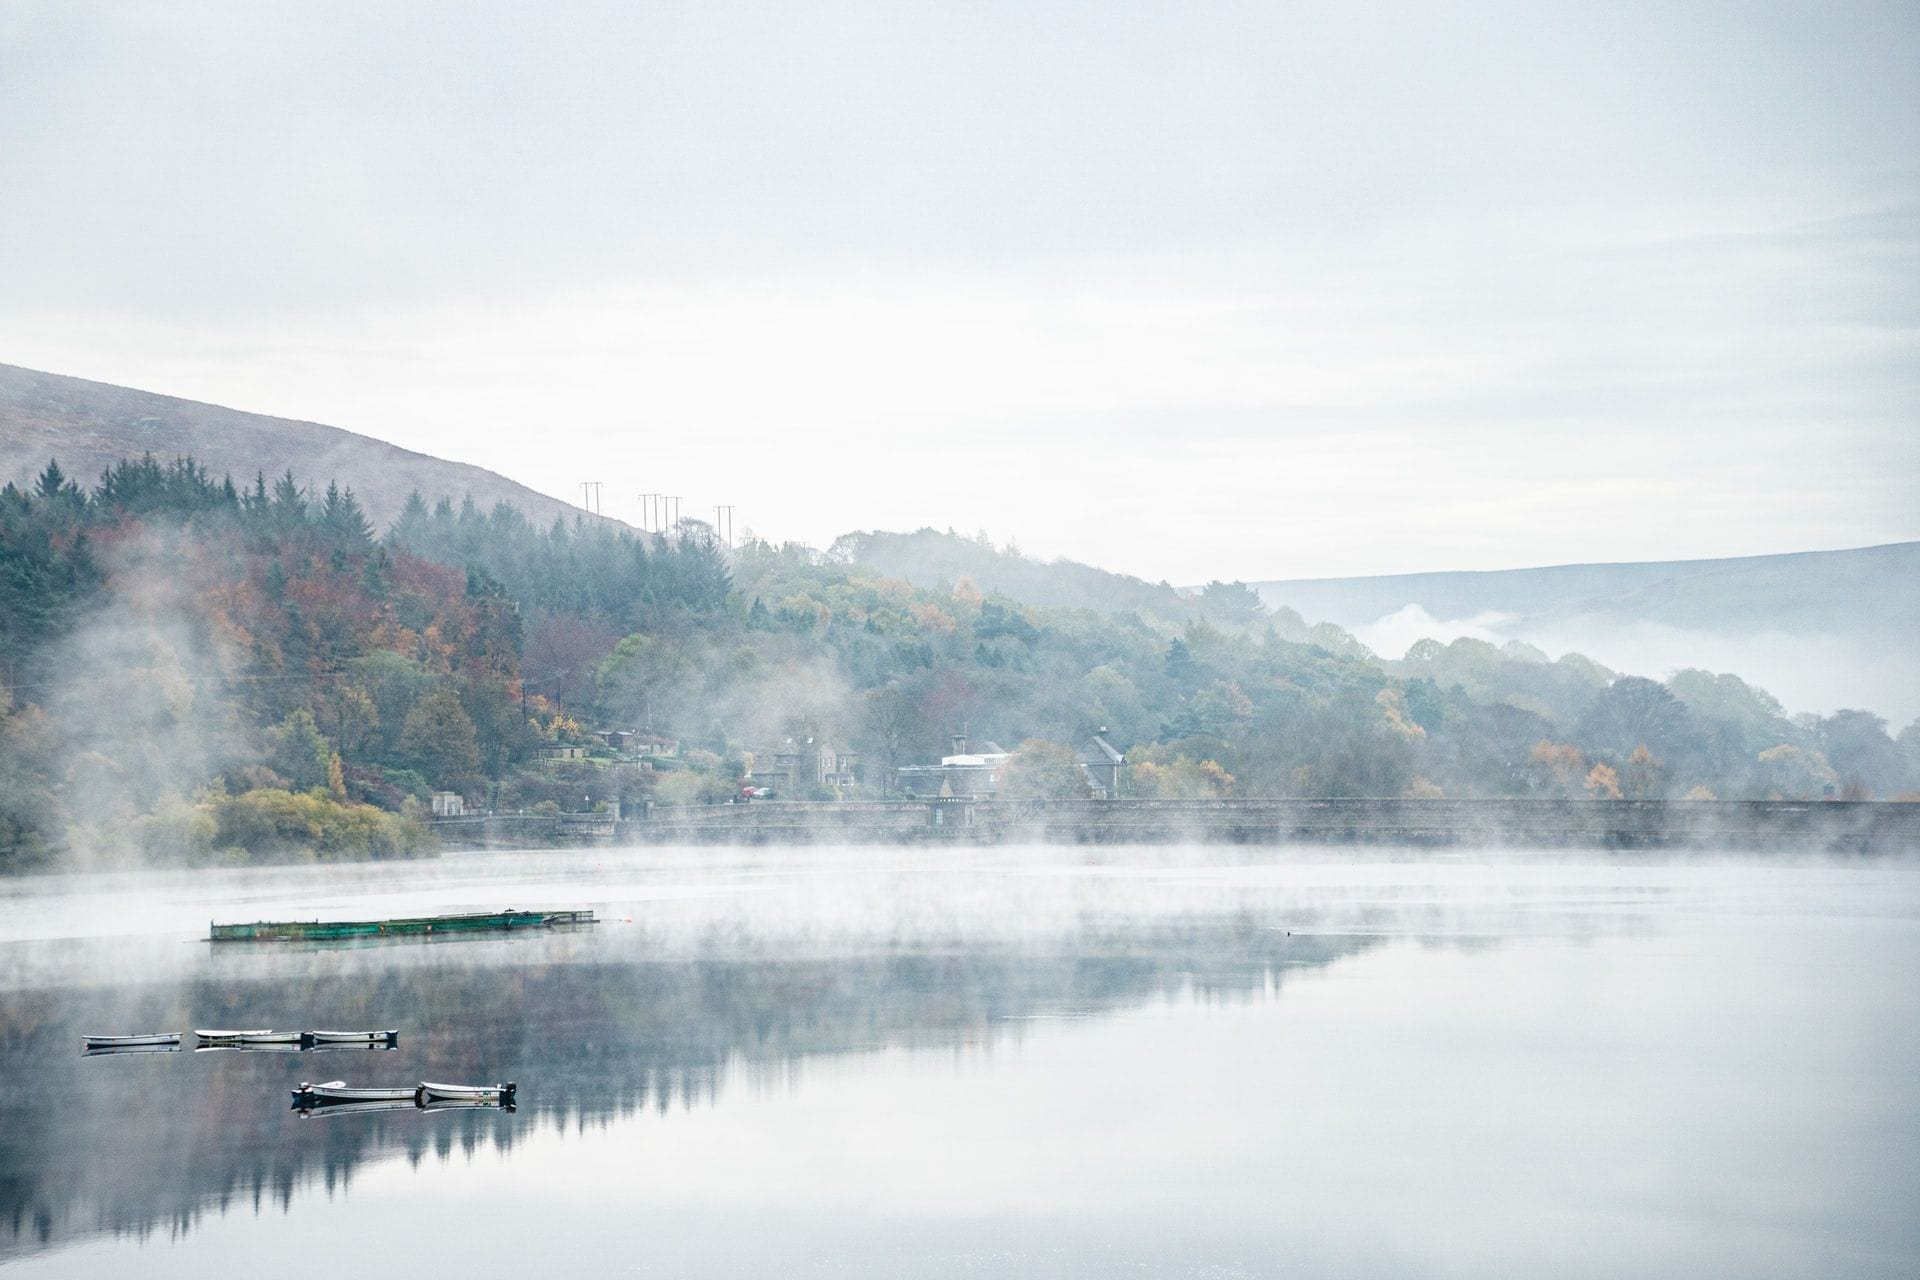 misty-foggy-lake-in-peak-district-england-in-winter